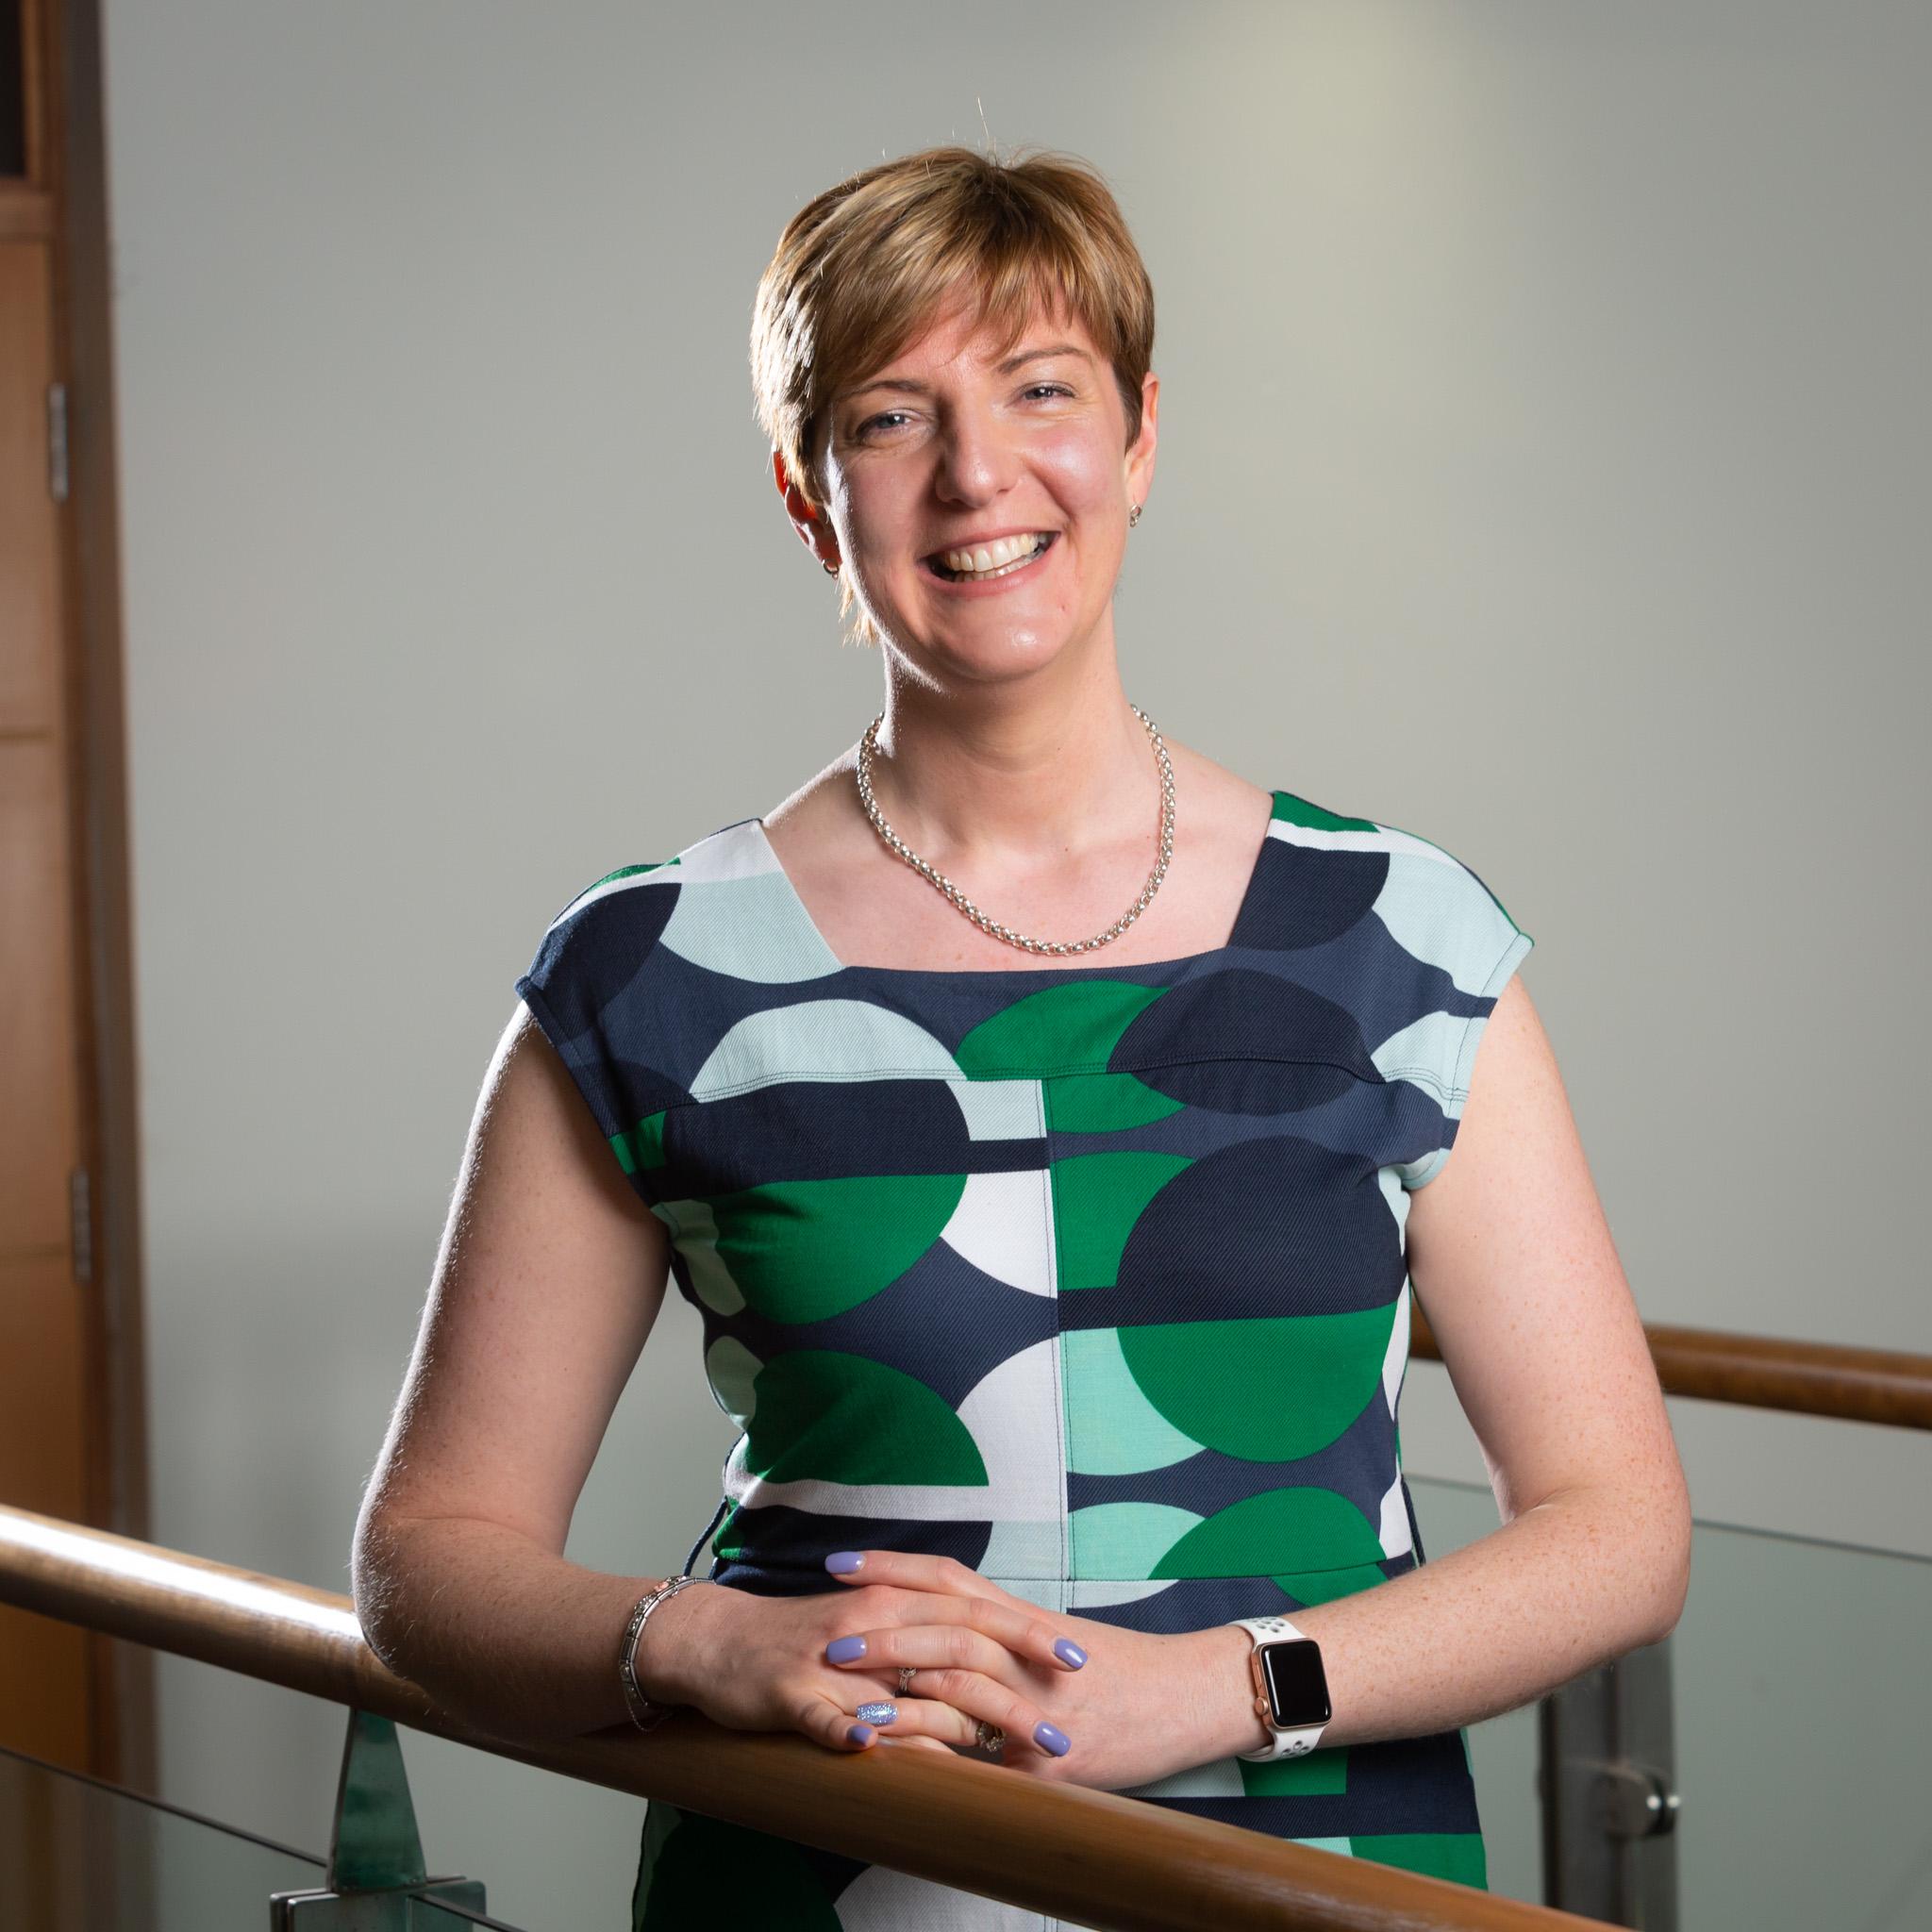 Sara Otley